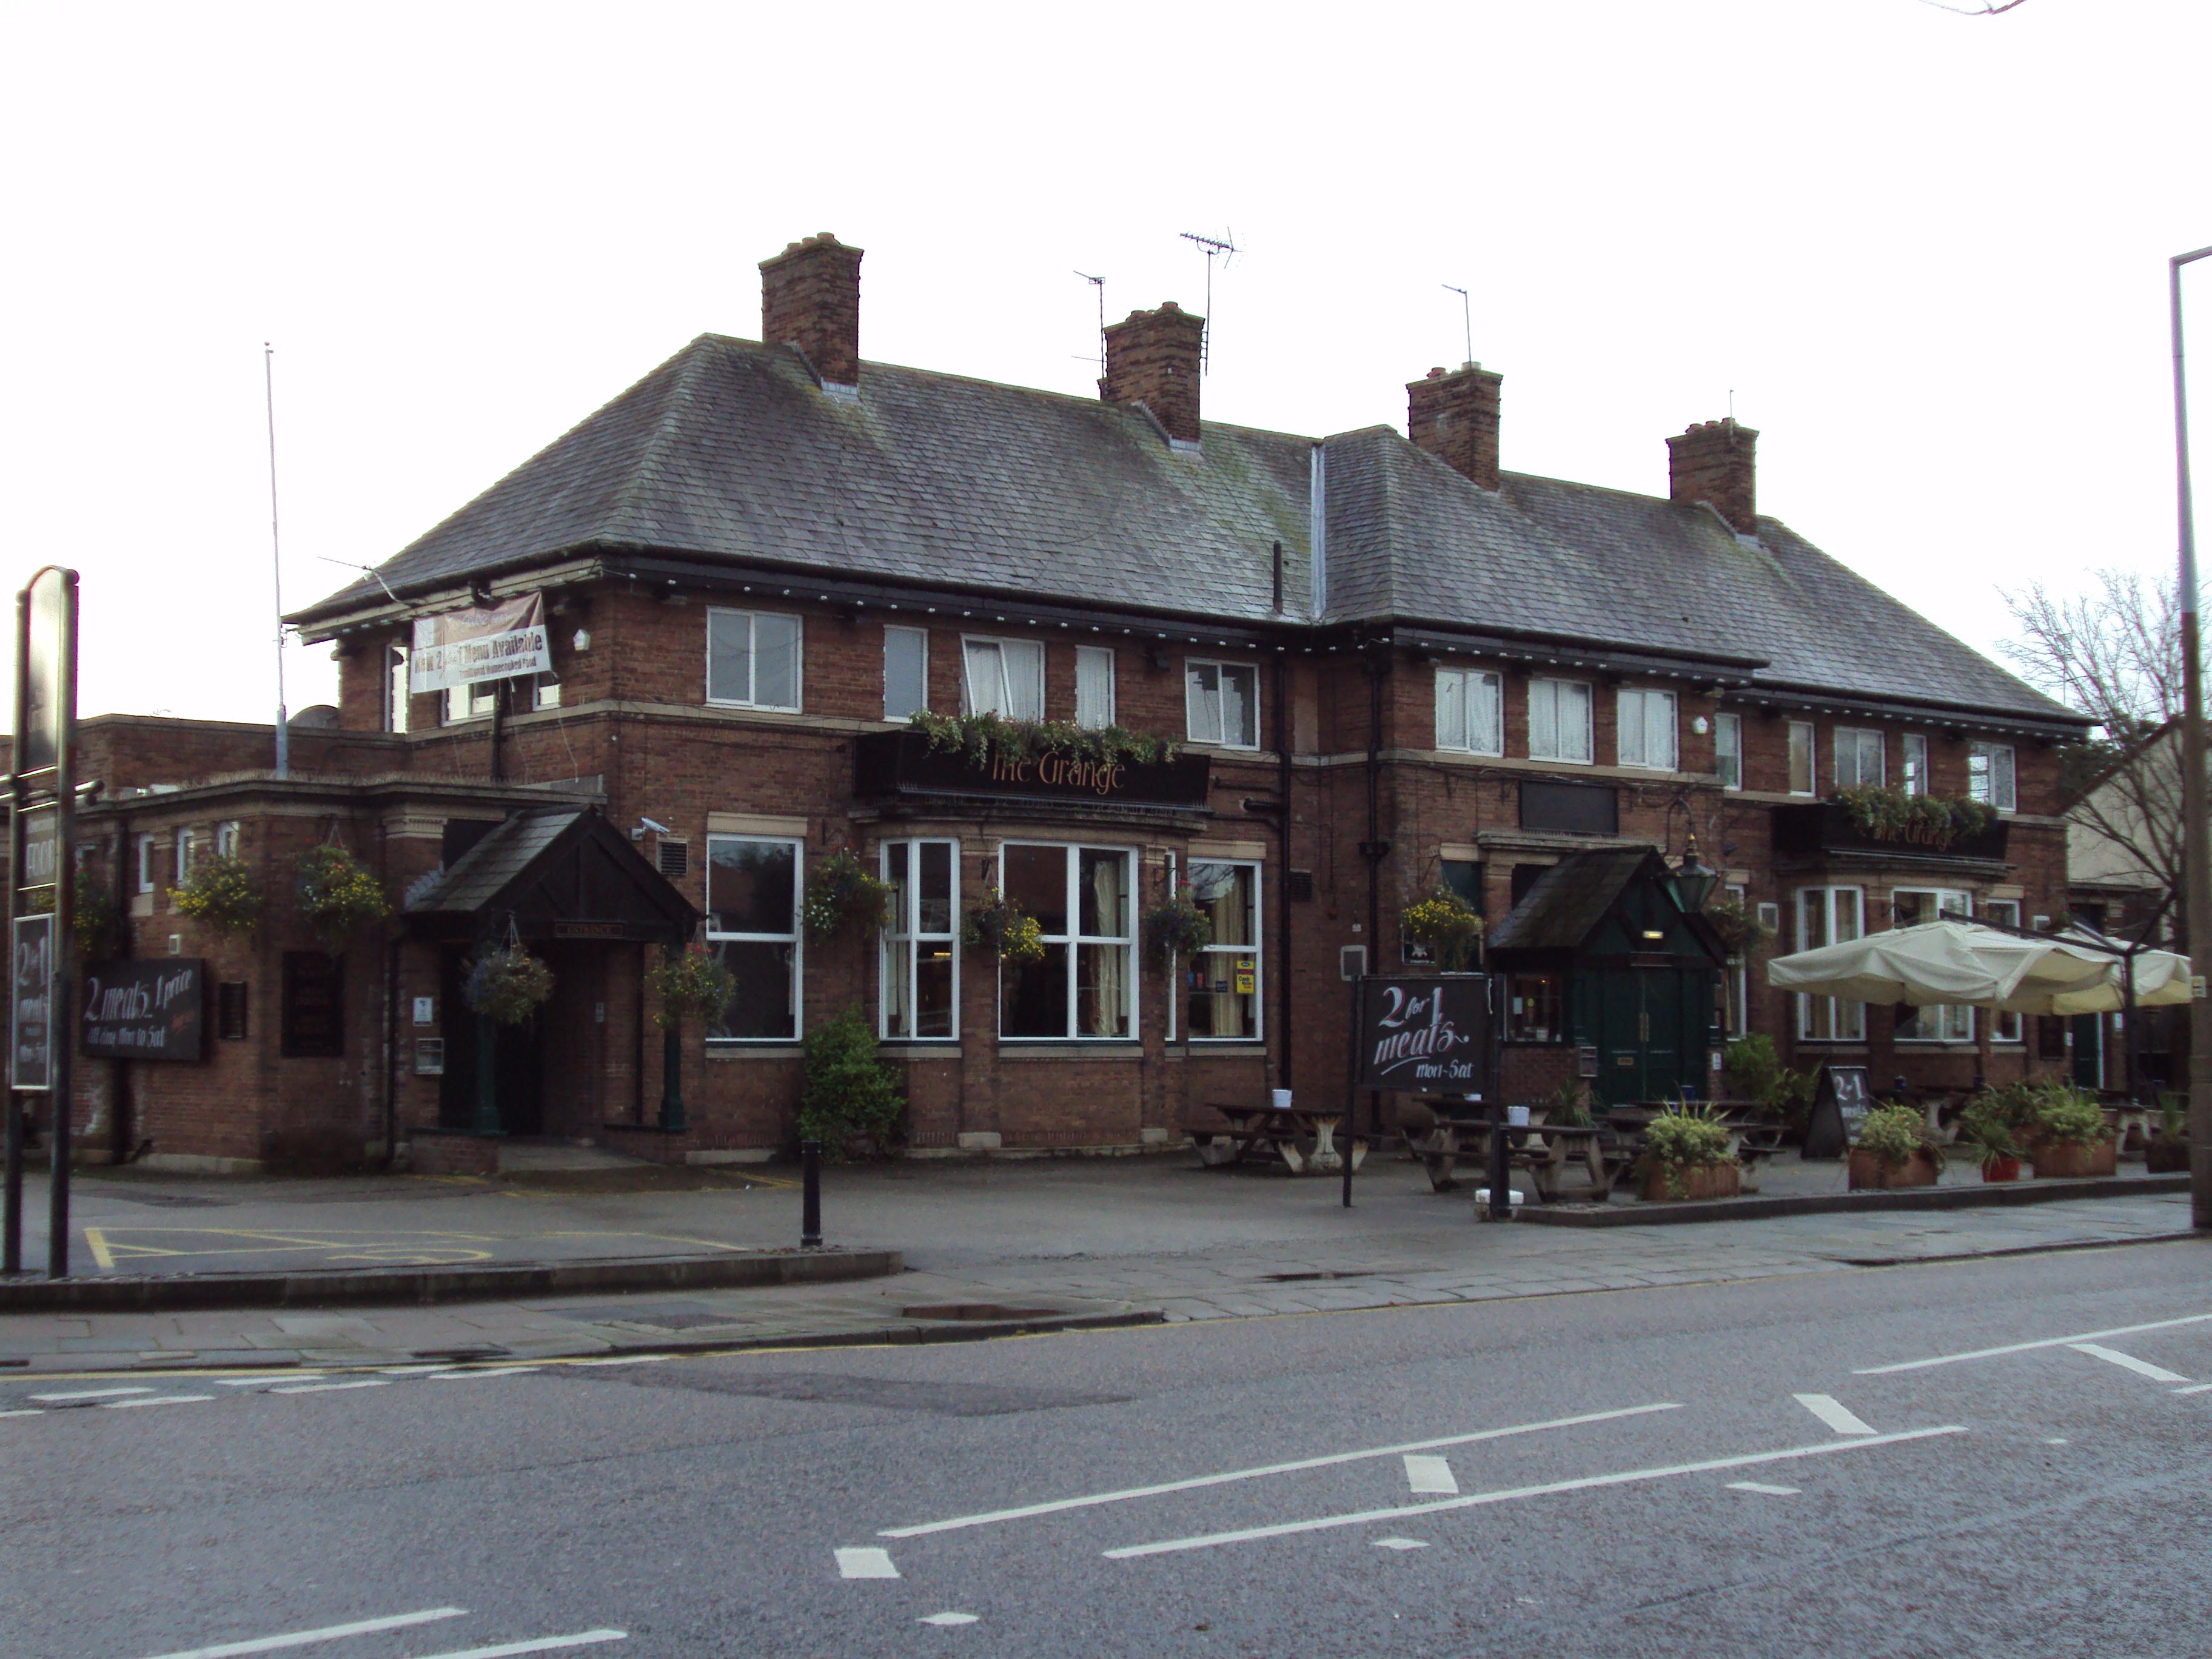 English In Italian: File:The Grange Pub, Moreton.JPG